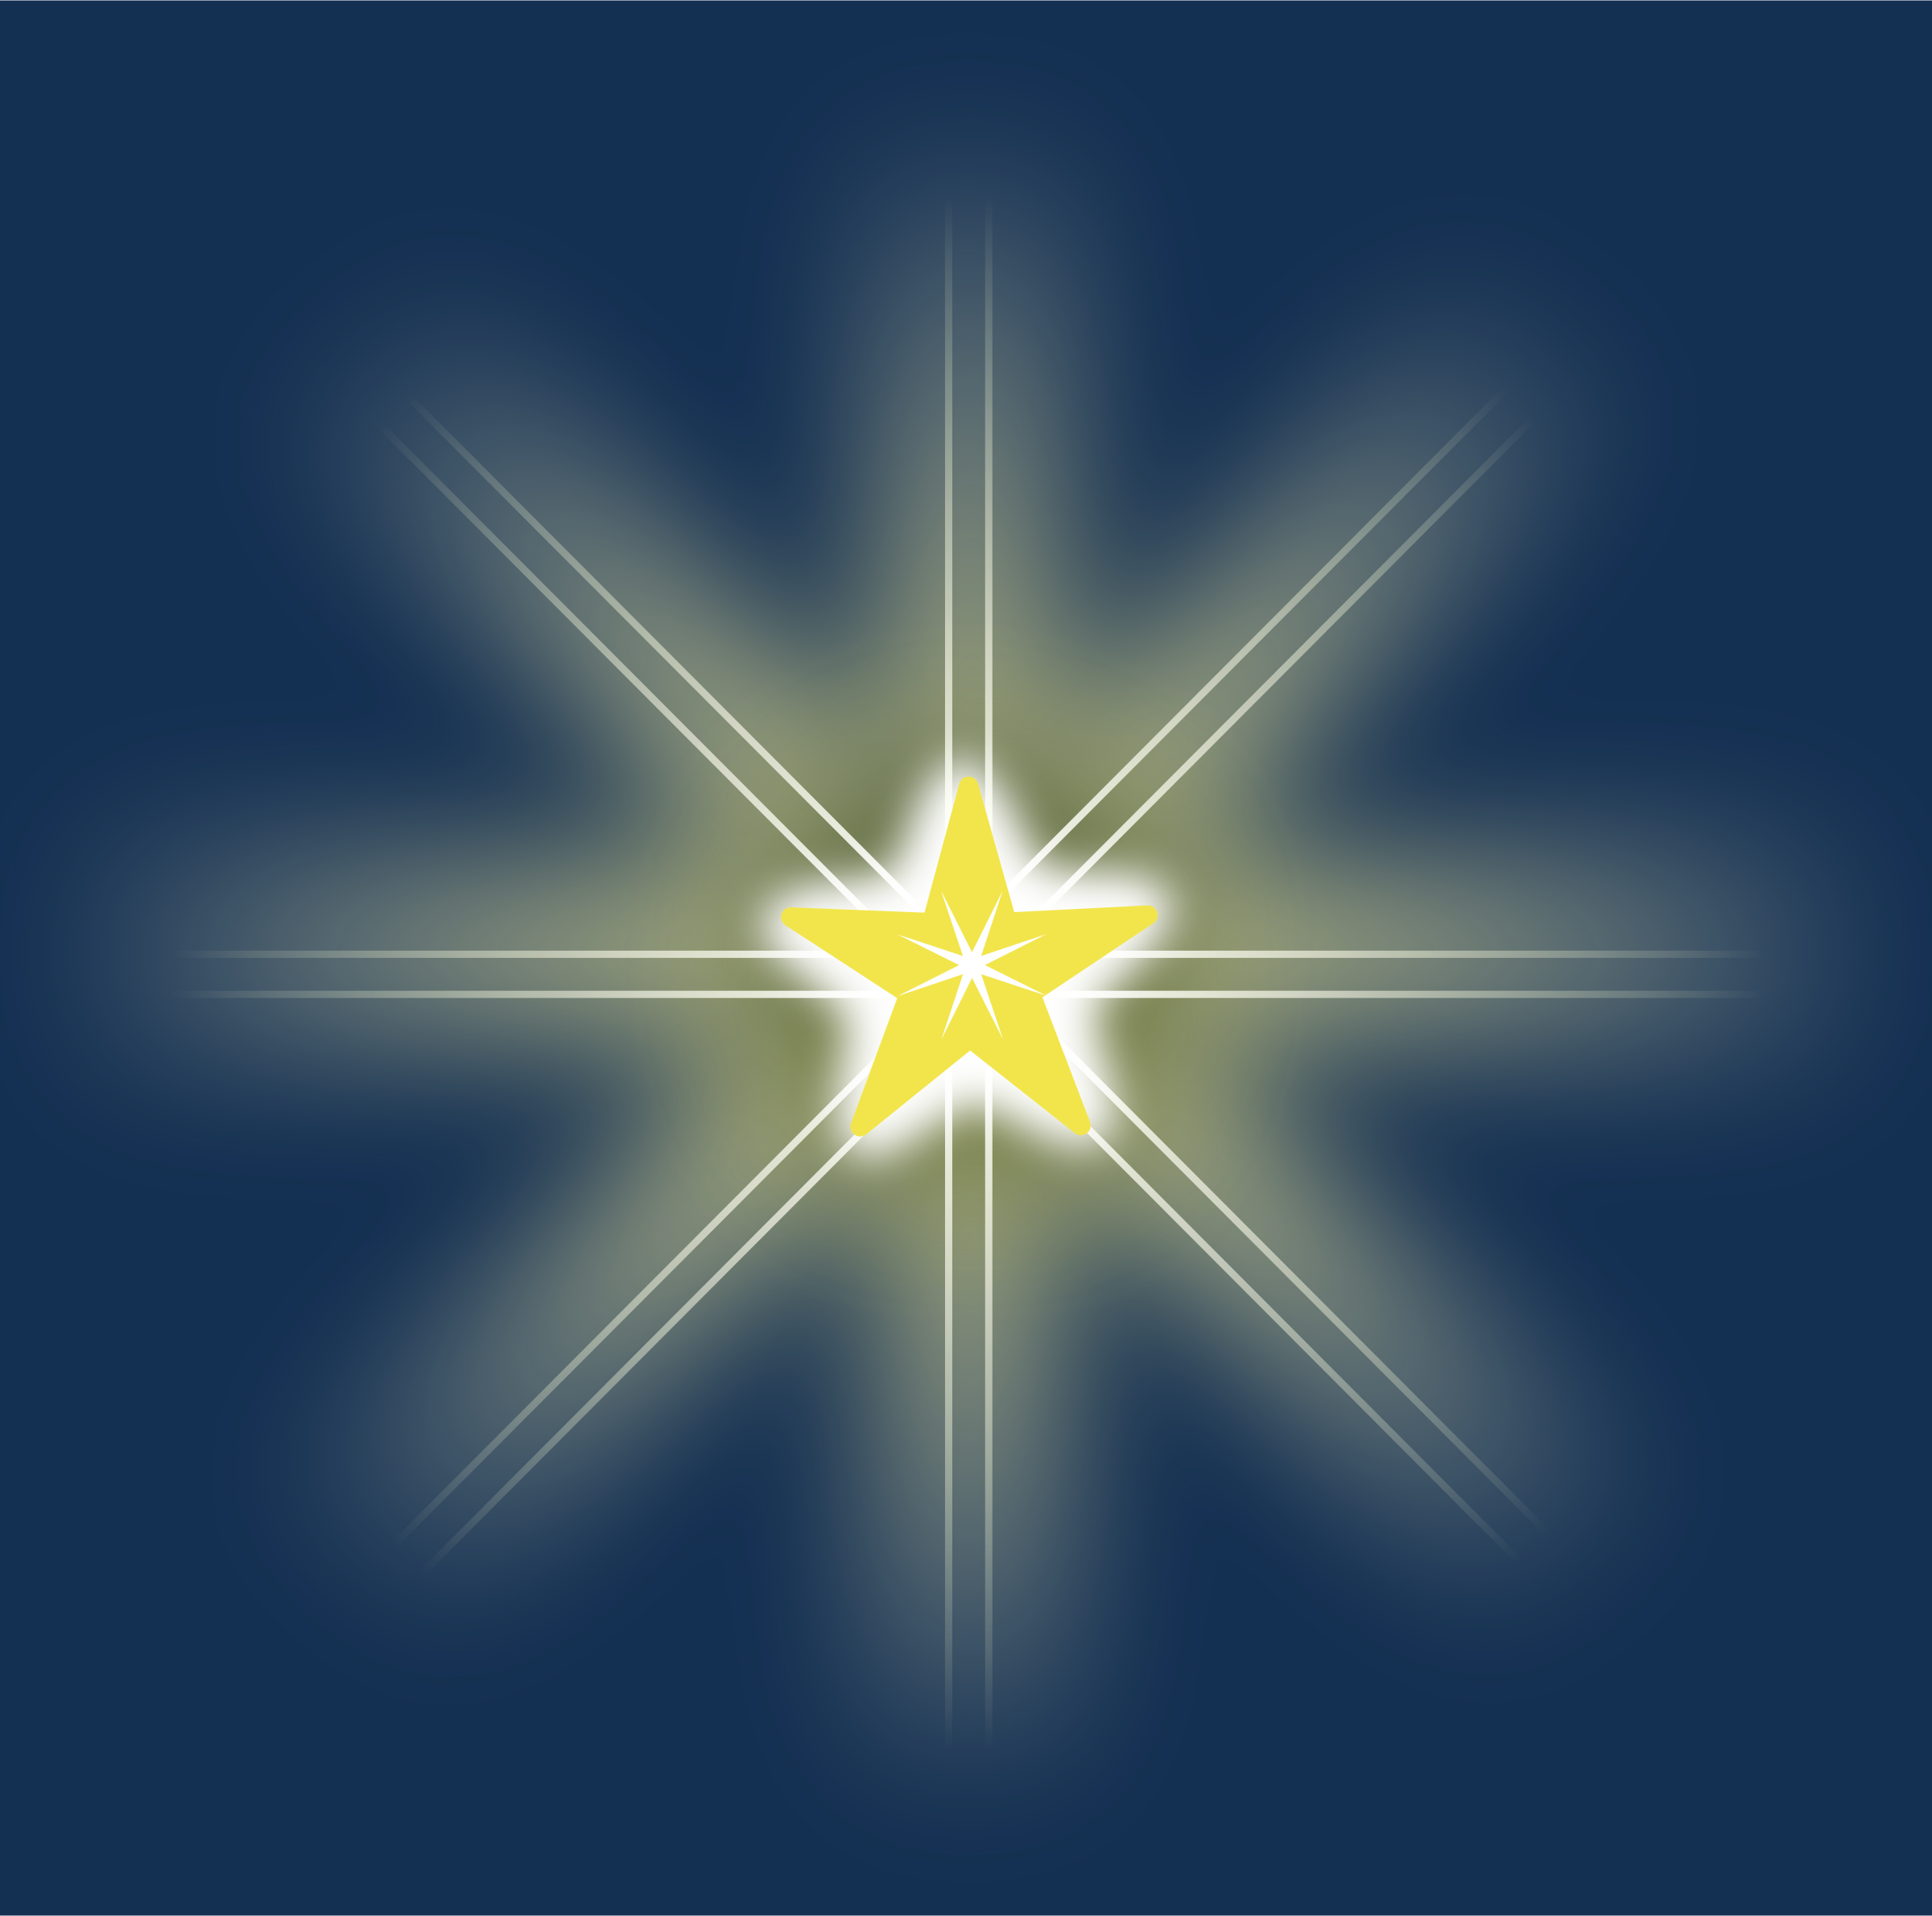 Clipart christmas star image #24753.